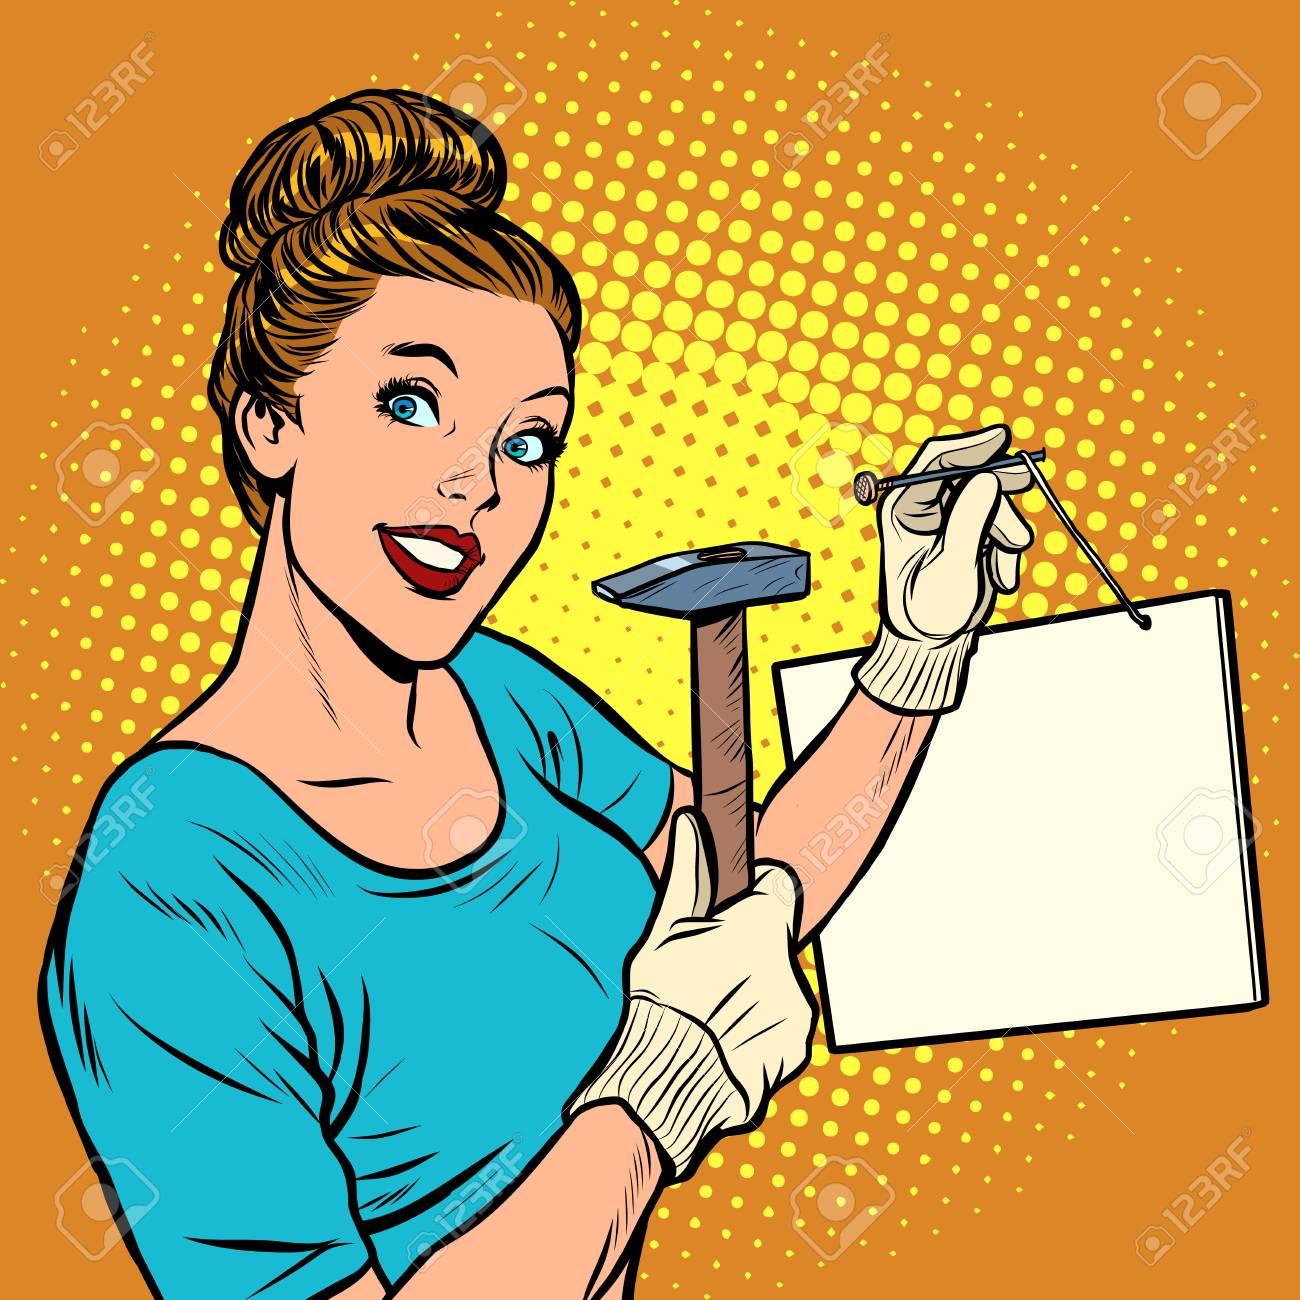 woman nails a sign information announcement. Pop art retro vector illustration vintage kitsch - 128167834